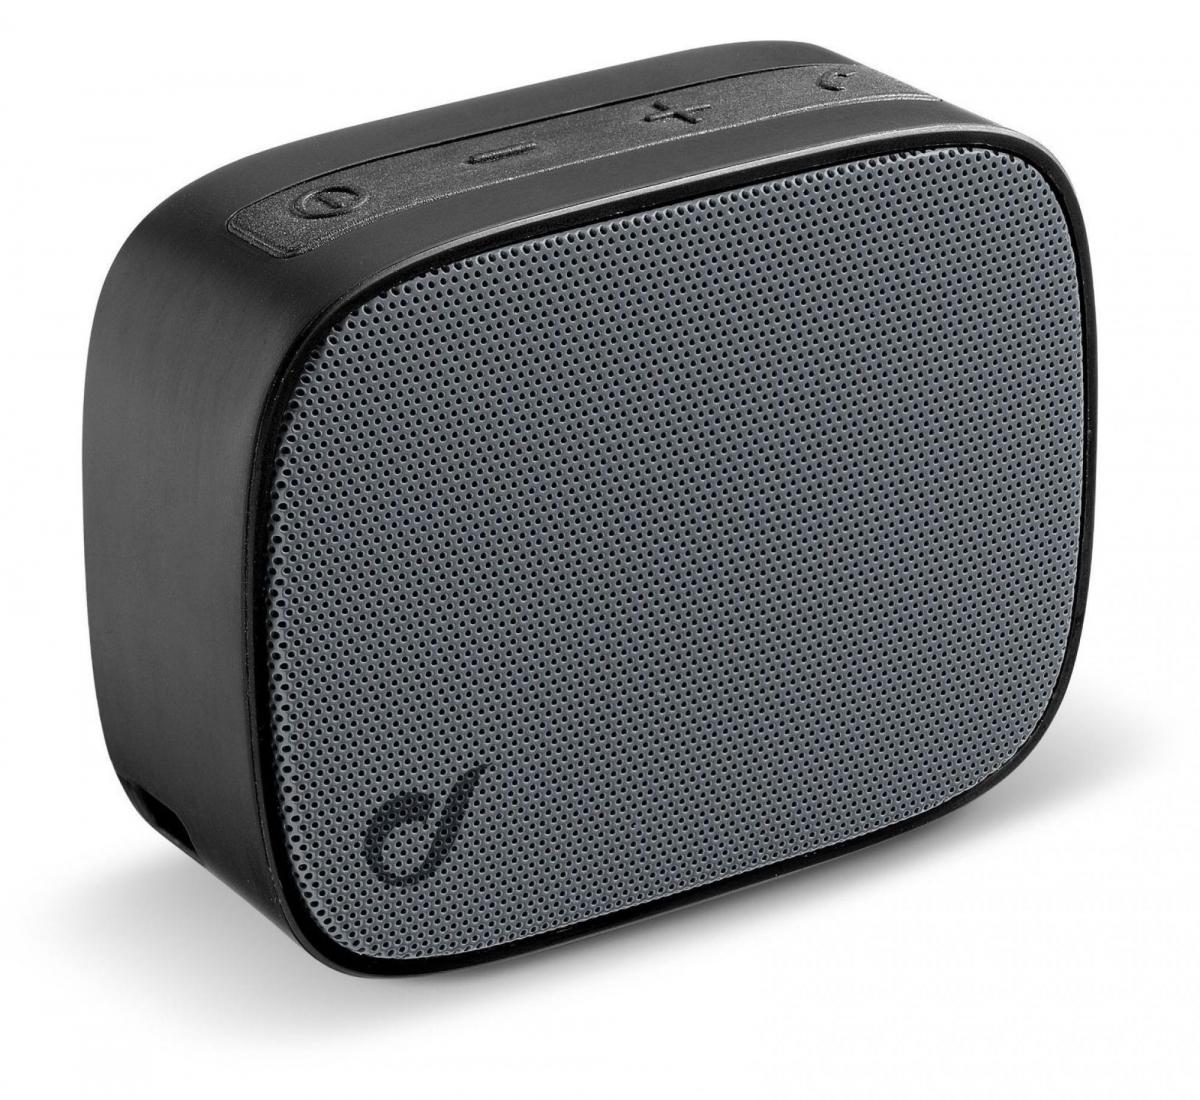 Bezdrátový reproduktor CellularLine Audio Fizzy - černý BTSPKFIZZYK